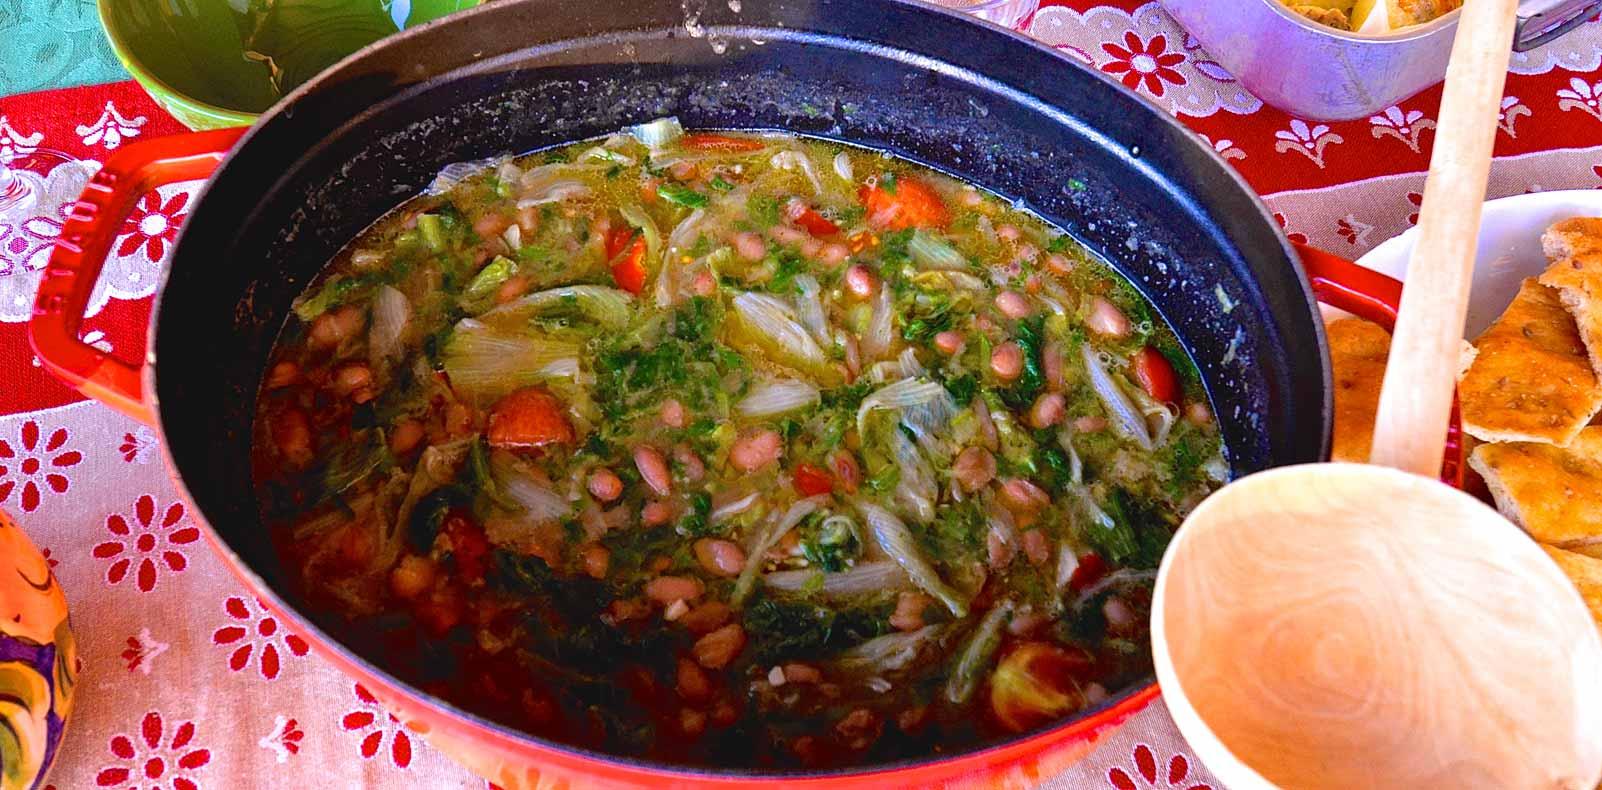 January 16: Escarole & Bean Soup Class